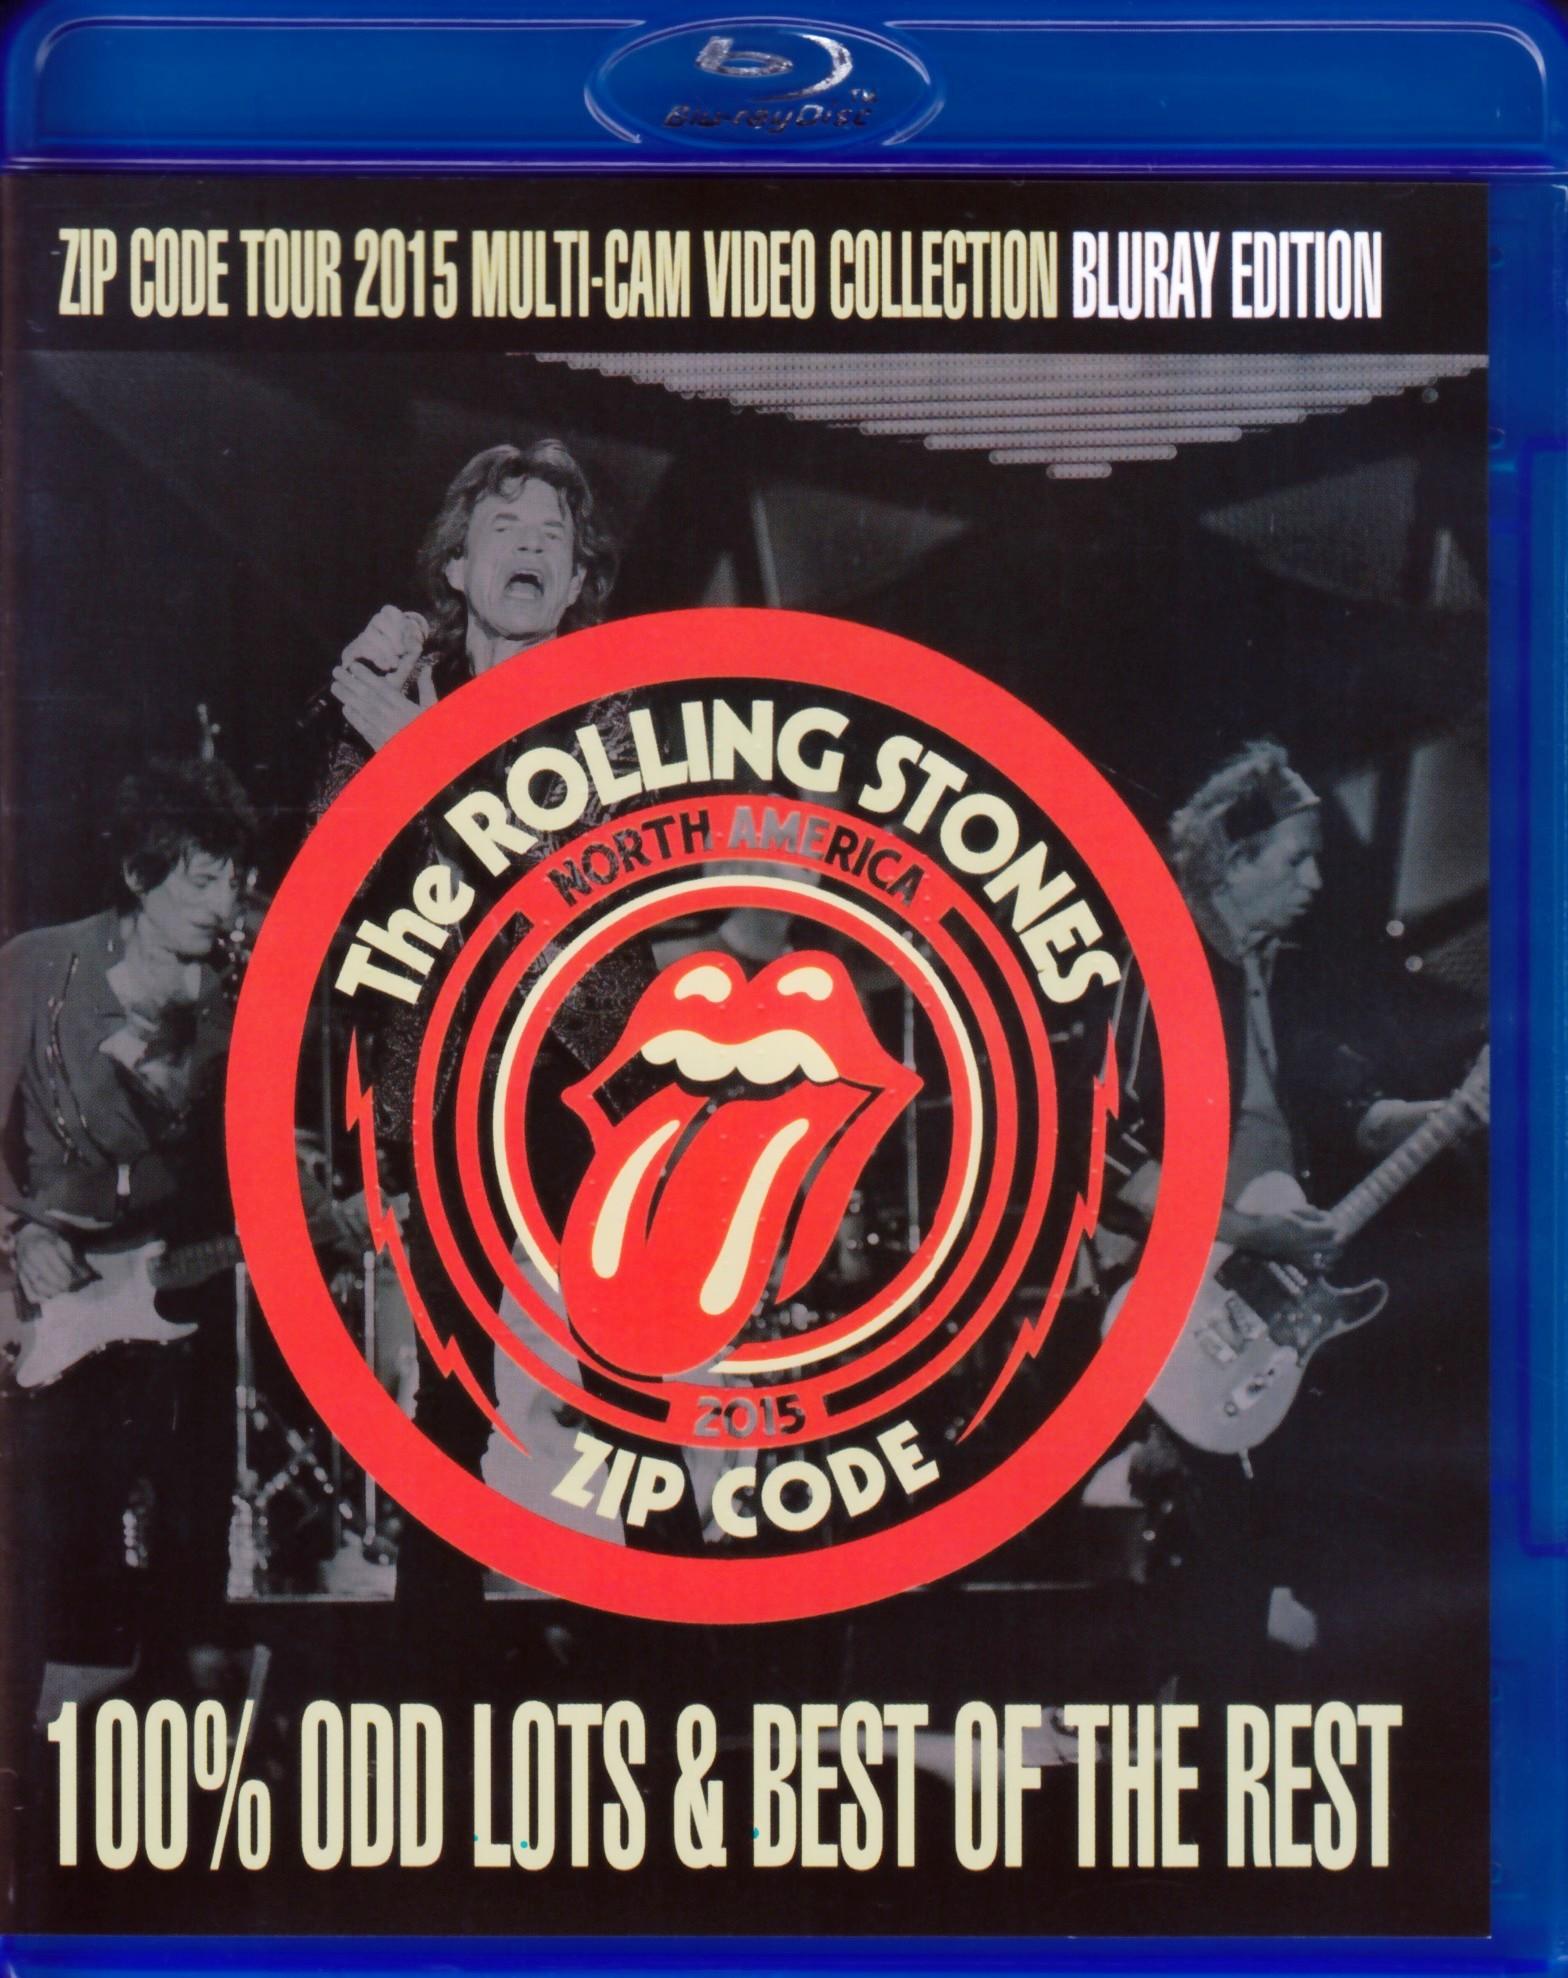 Rolling Stones ローリング・ストーンズ/North America  2015 Vol.2 Blu-Ray Version